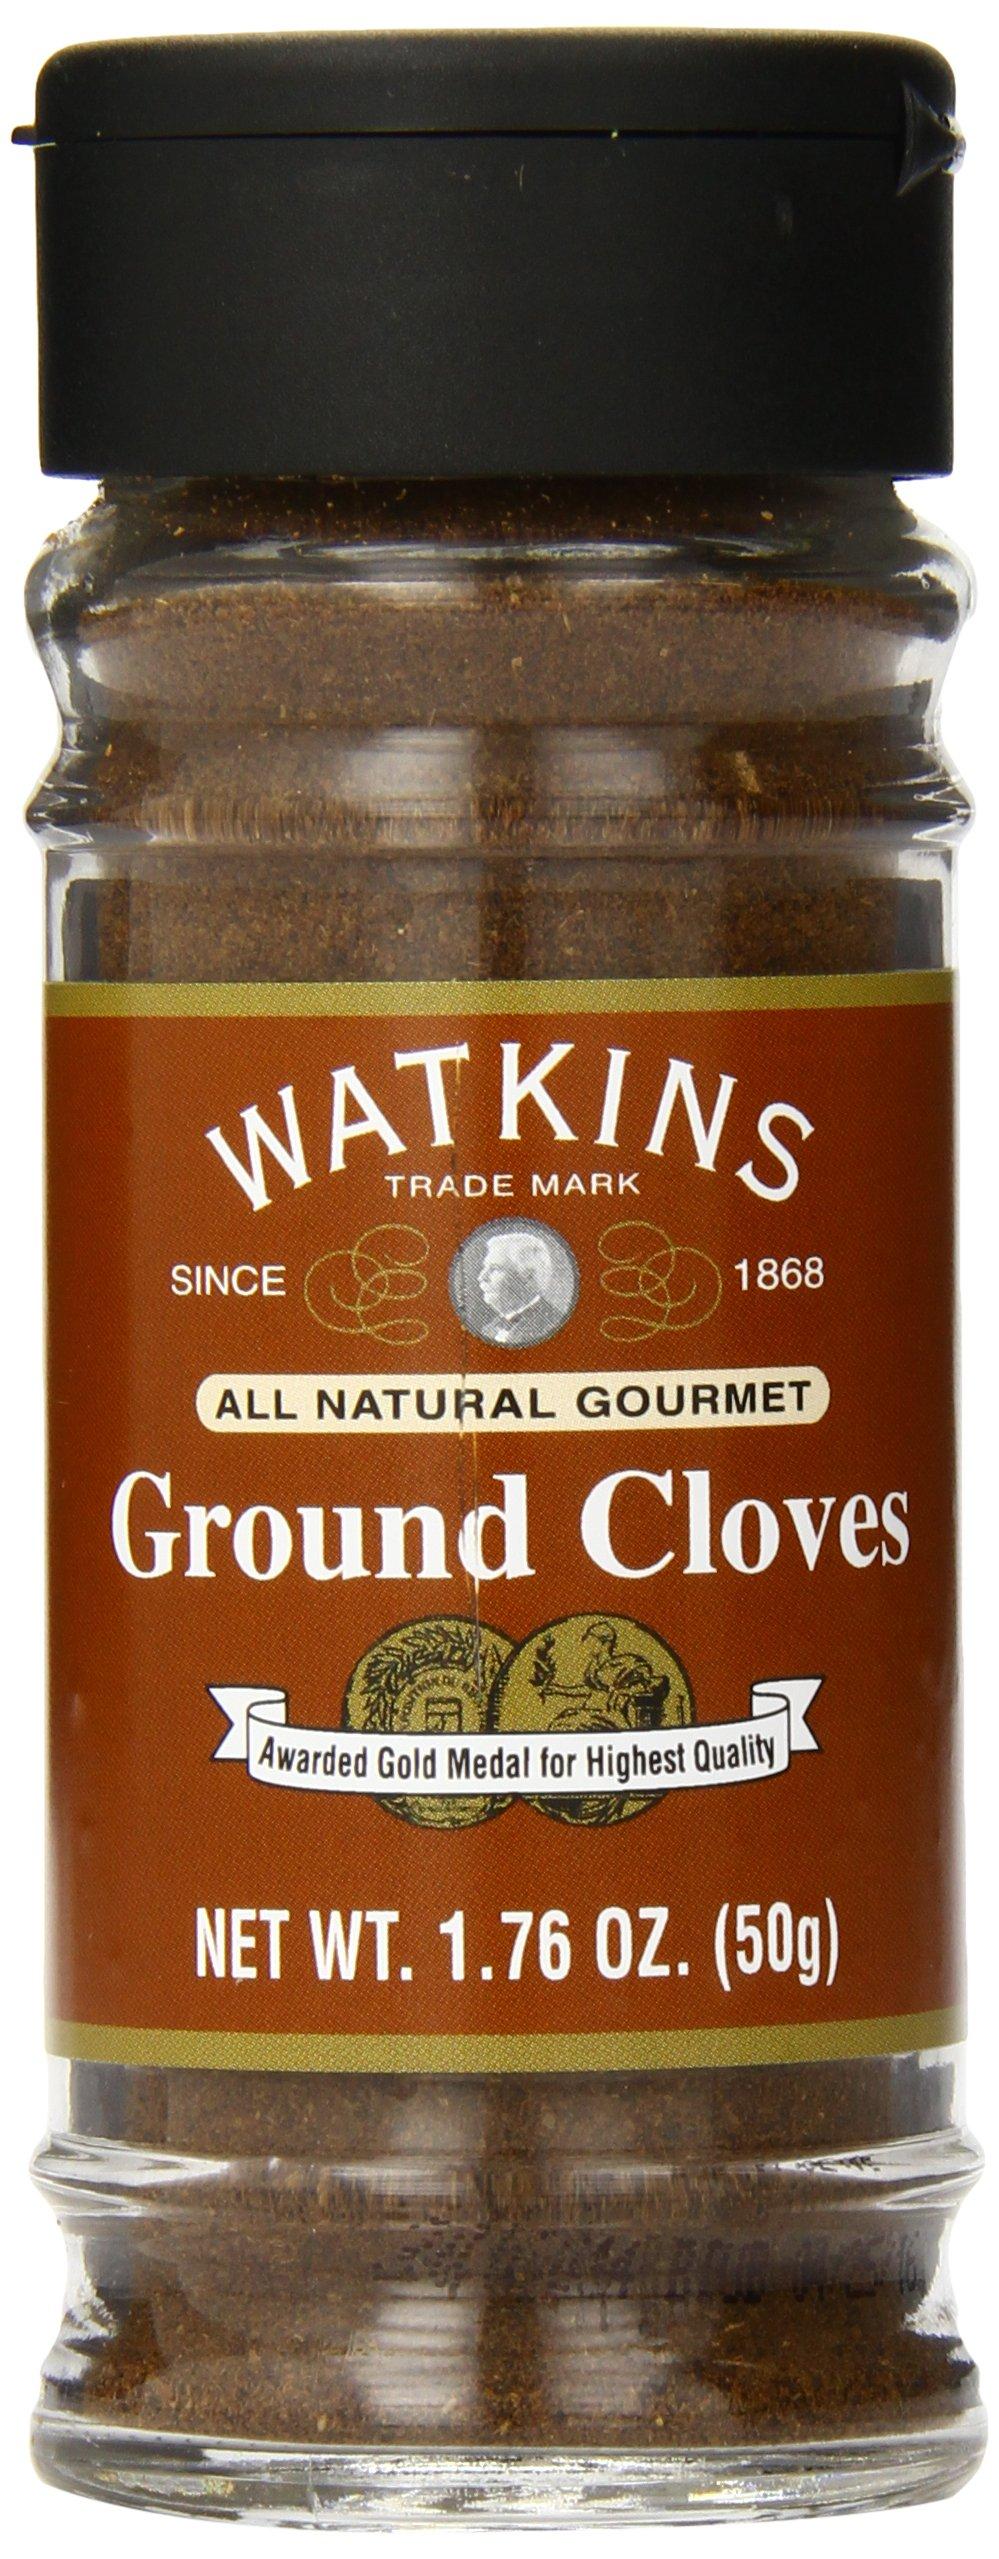 Watkins All Natural Gourmet Spice, Ground Cloves, 1.76 Ounce